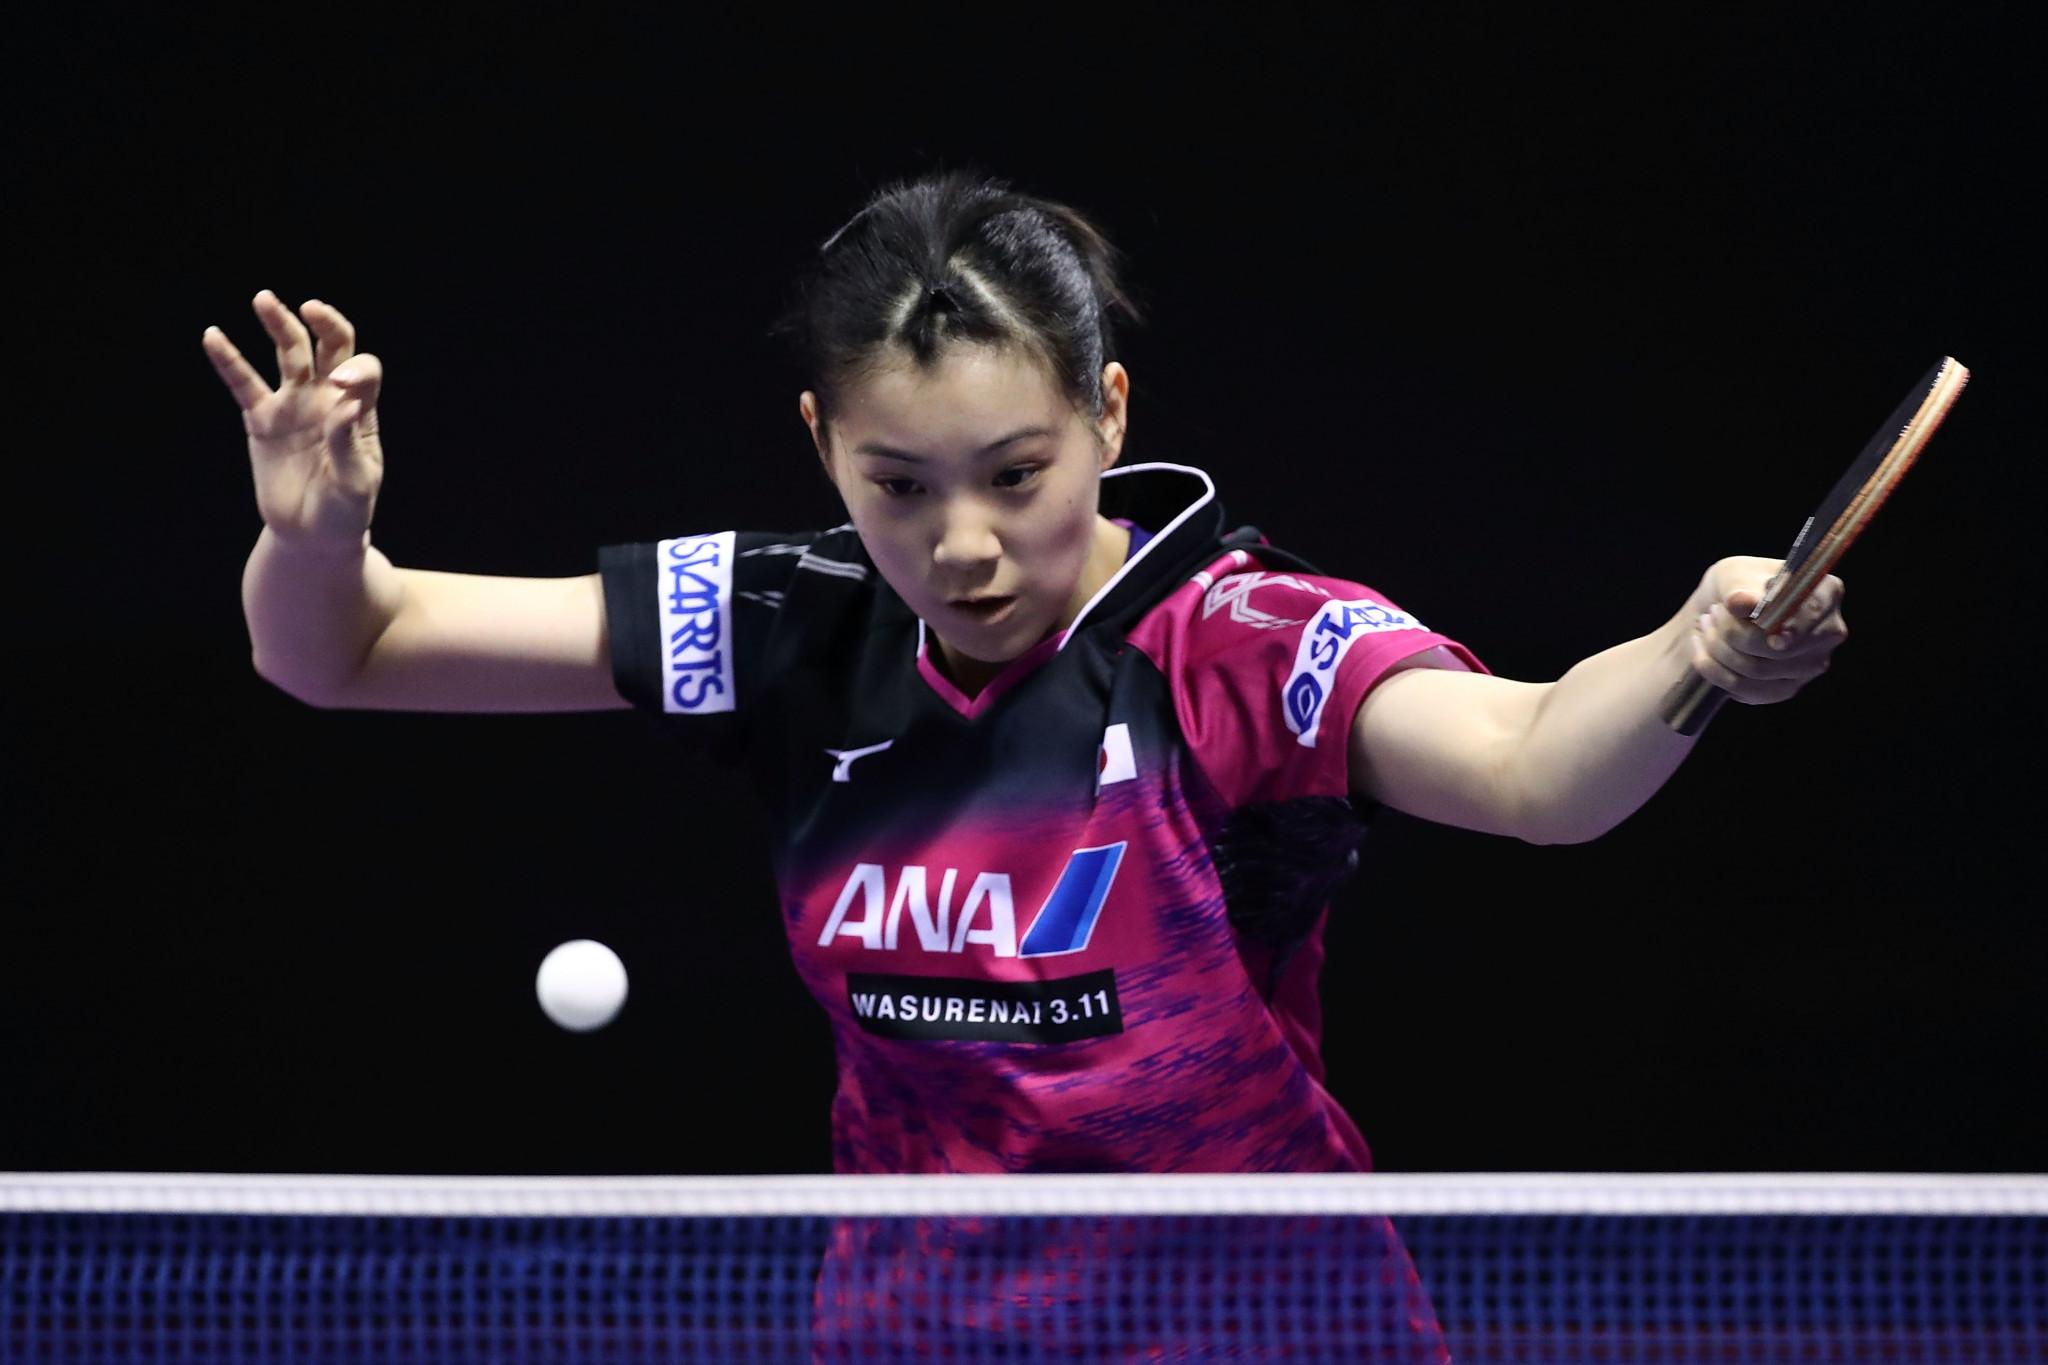 Japan's Nagasaki and Peng of China win ITTF world junior titles in Korat